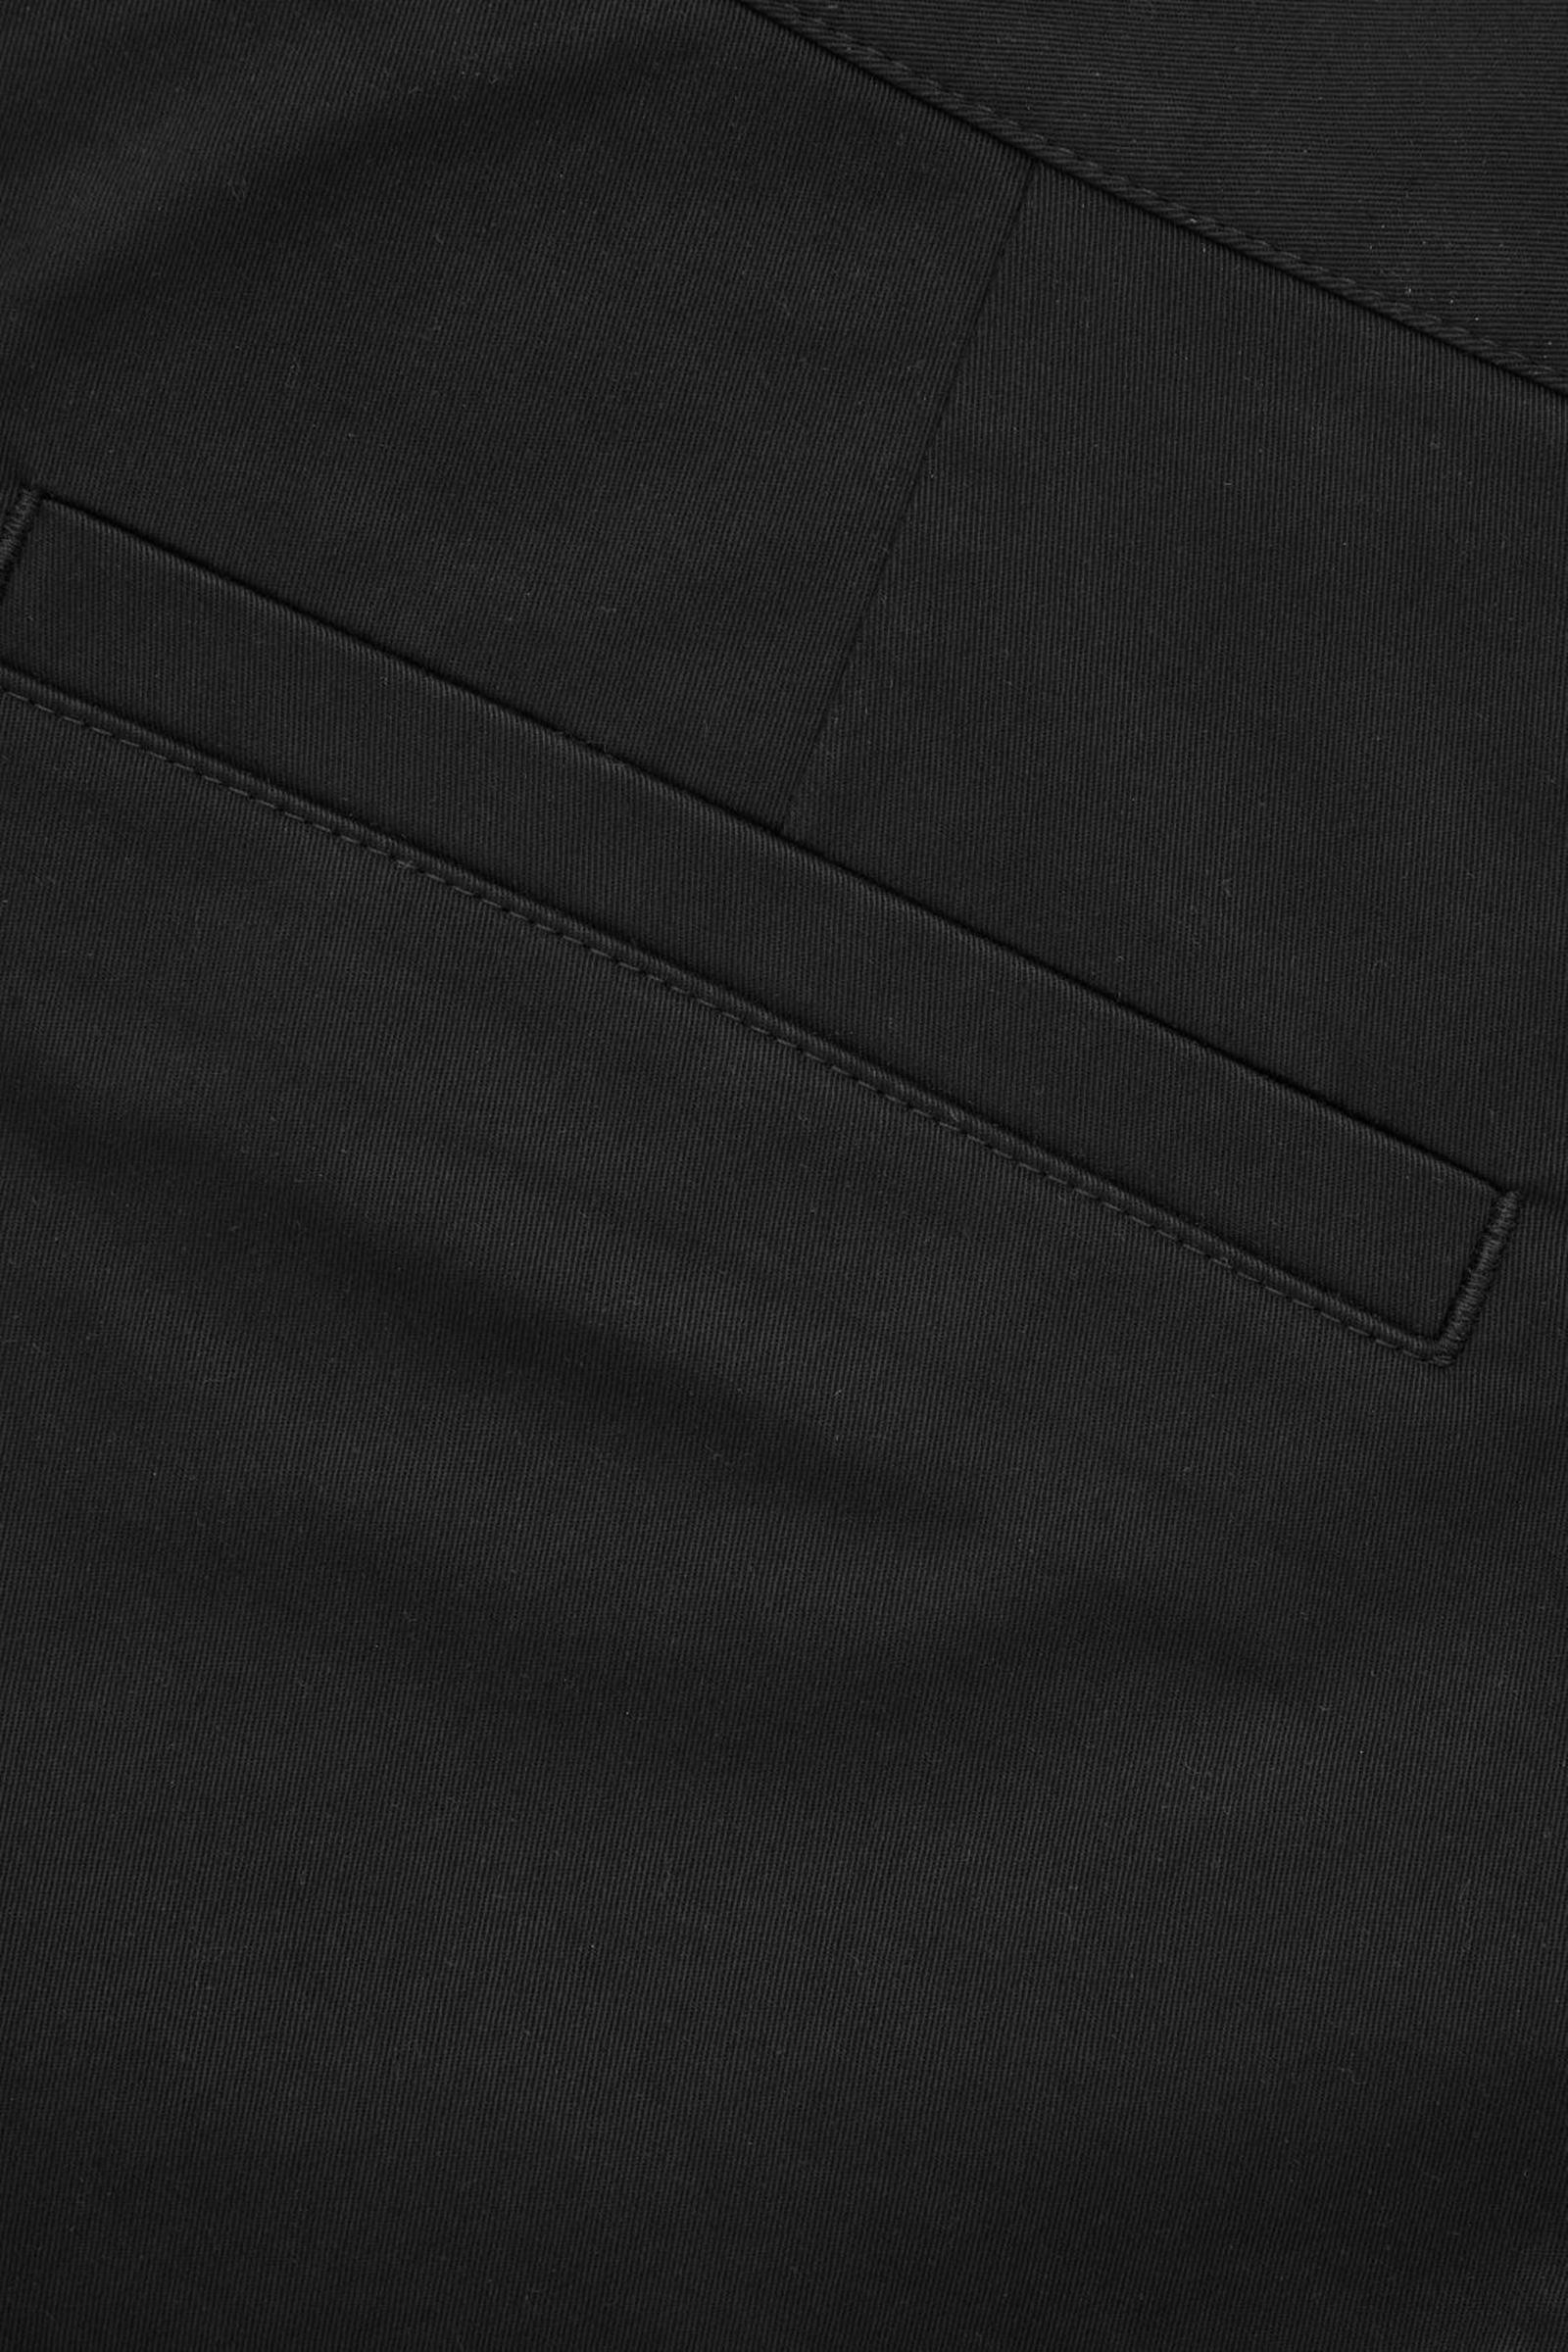 COS 코튼 슬림 레그 치노 트라우저의 미드나이트 블루컬러 Detail입니다.